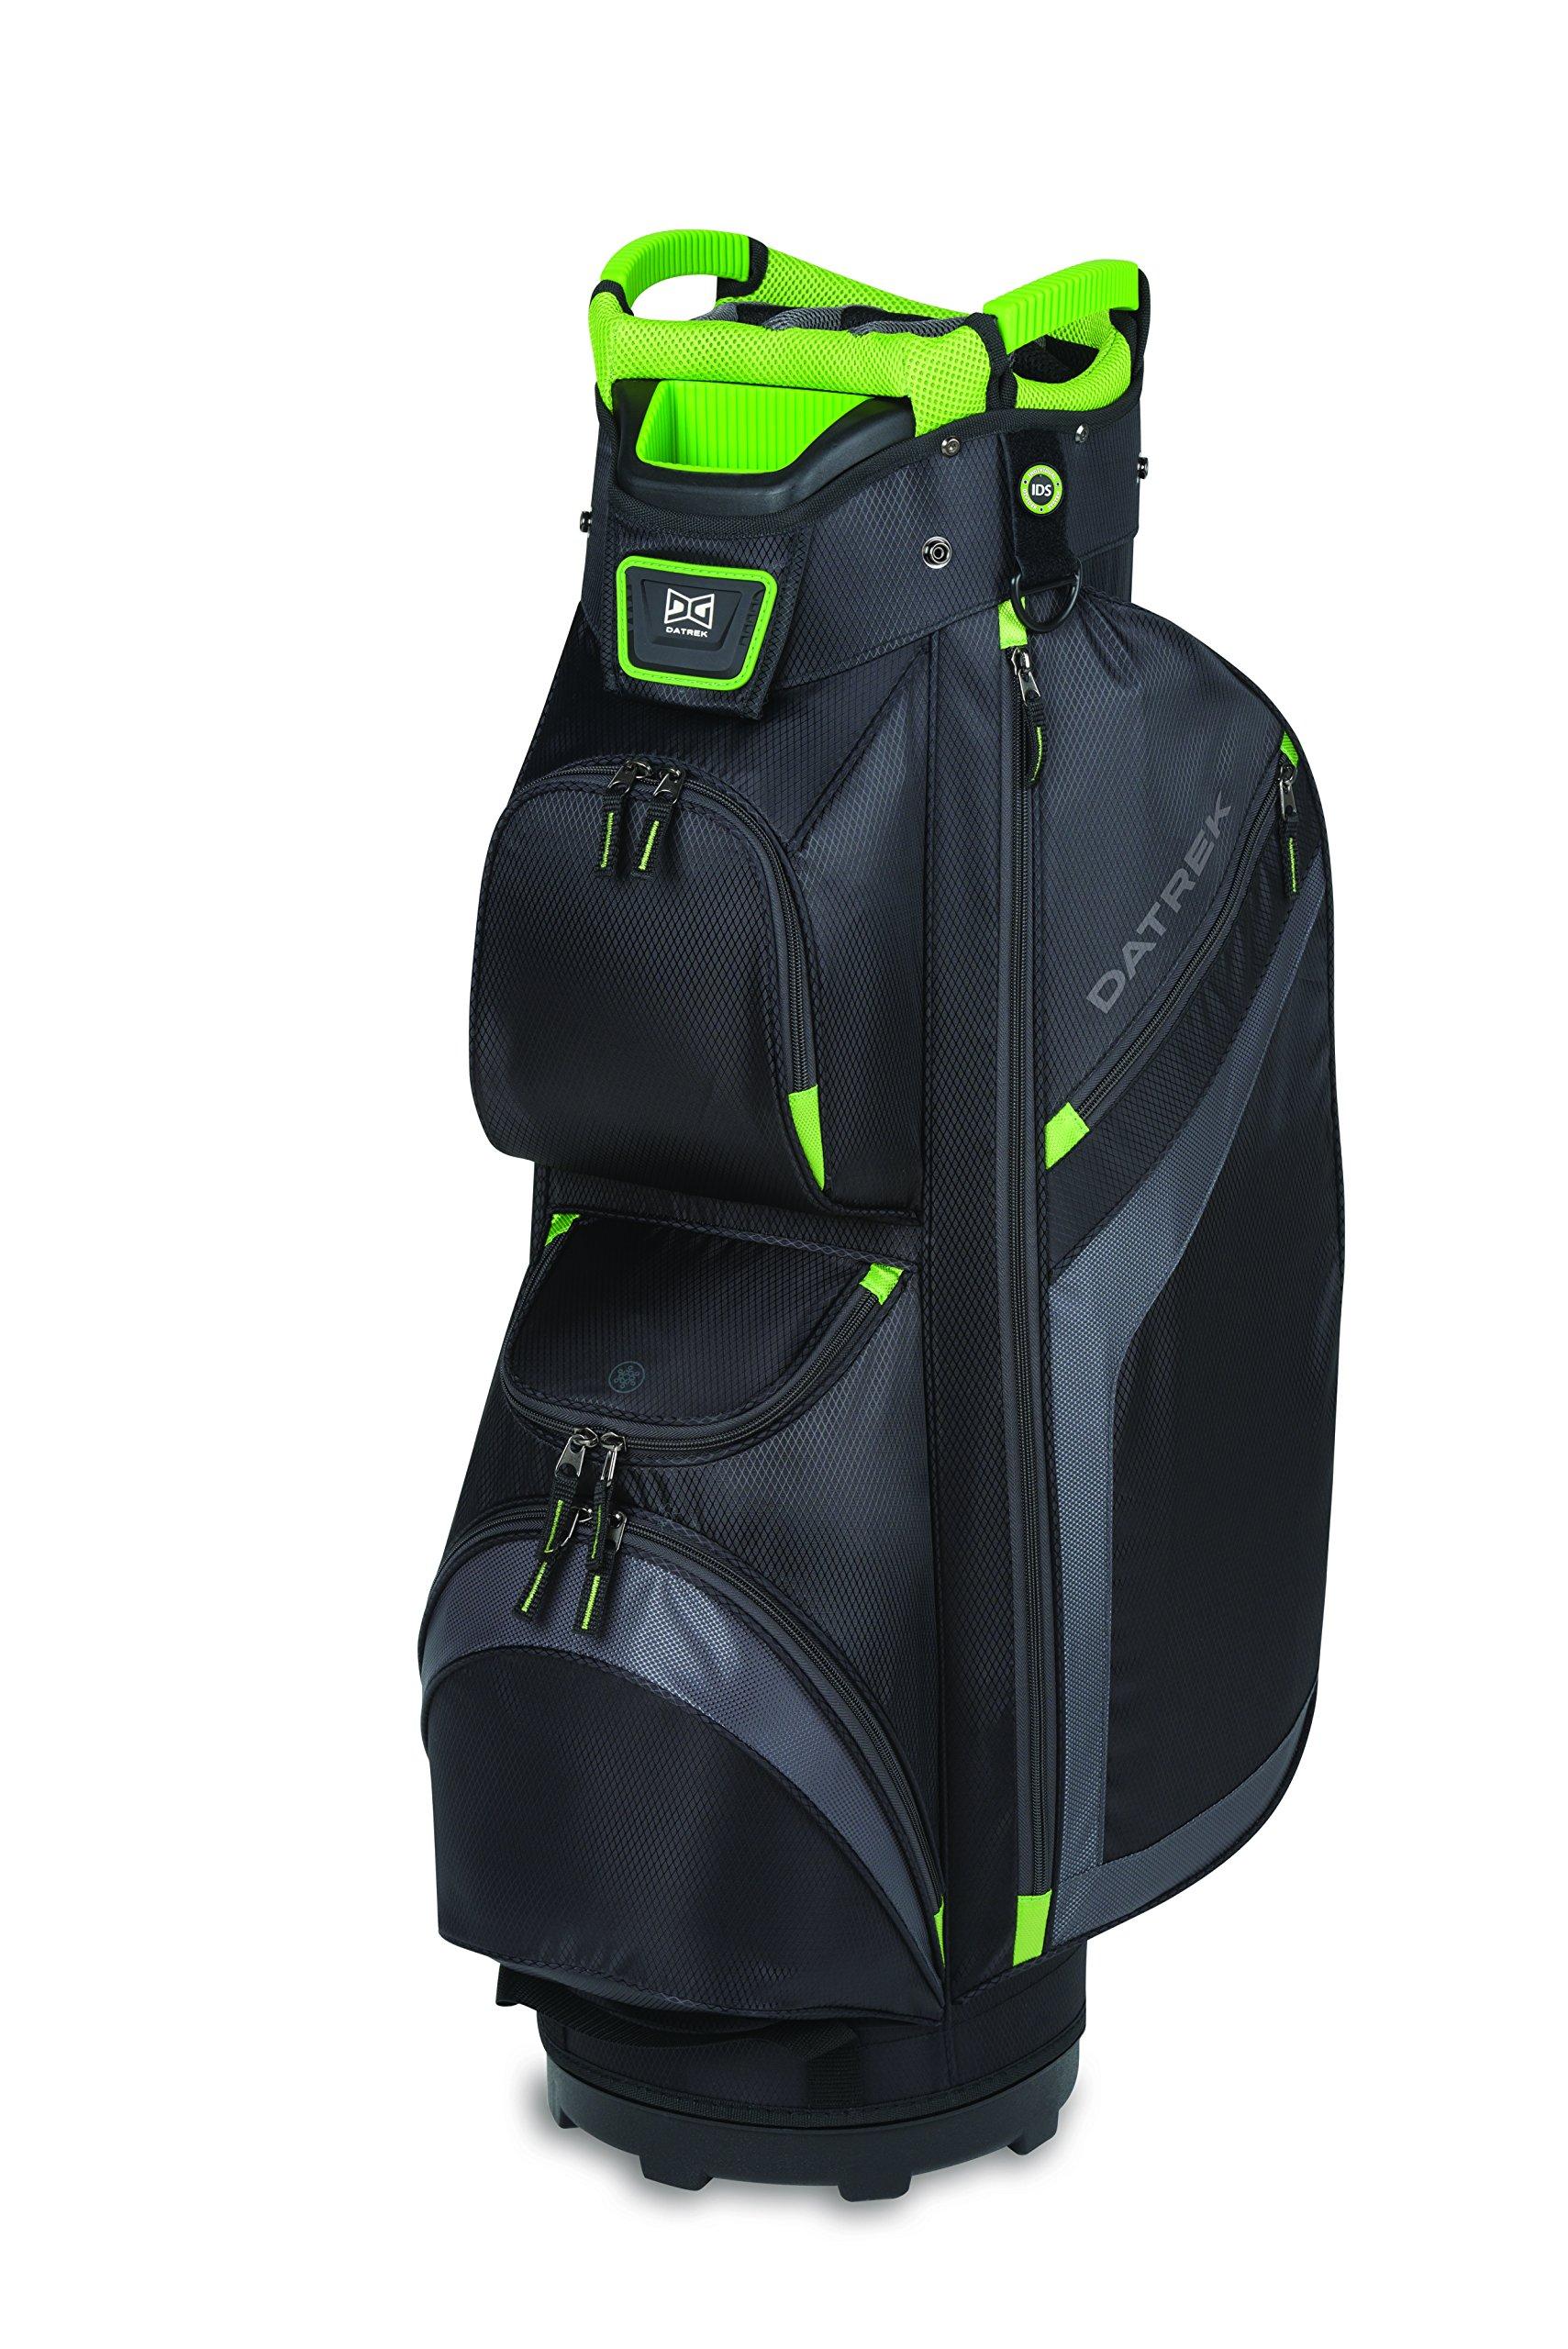 Datrek DG Lite II Cart Bag Black/Charcoal/Lime DG Lite II Cart Bag